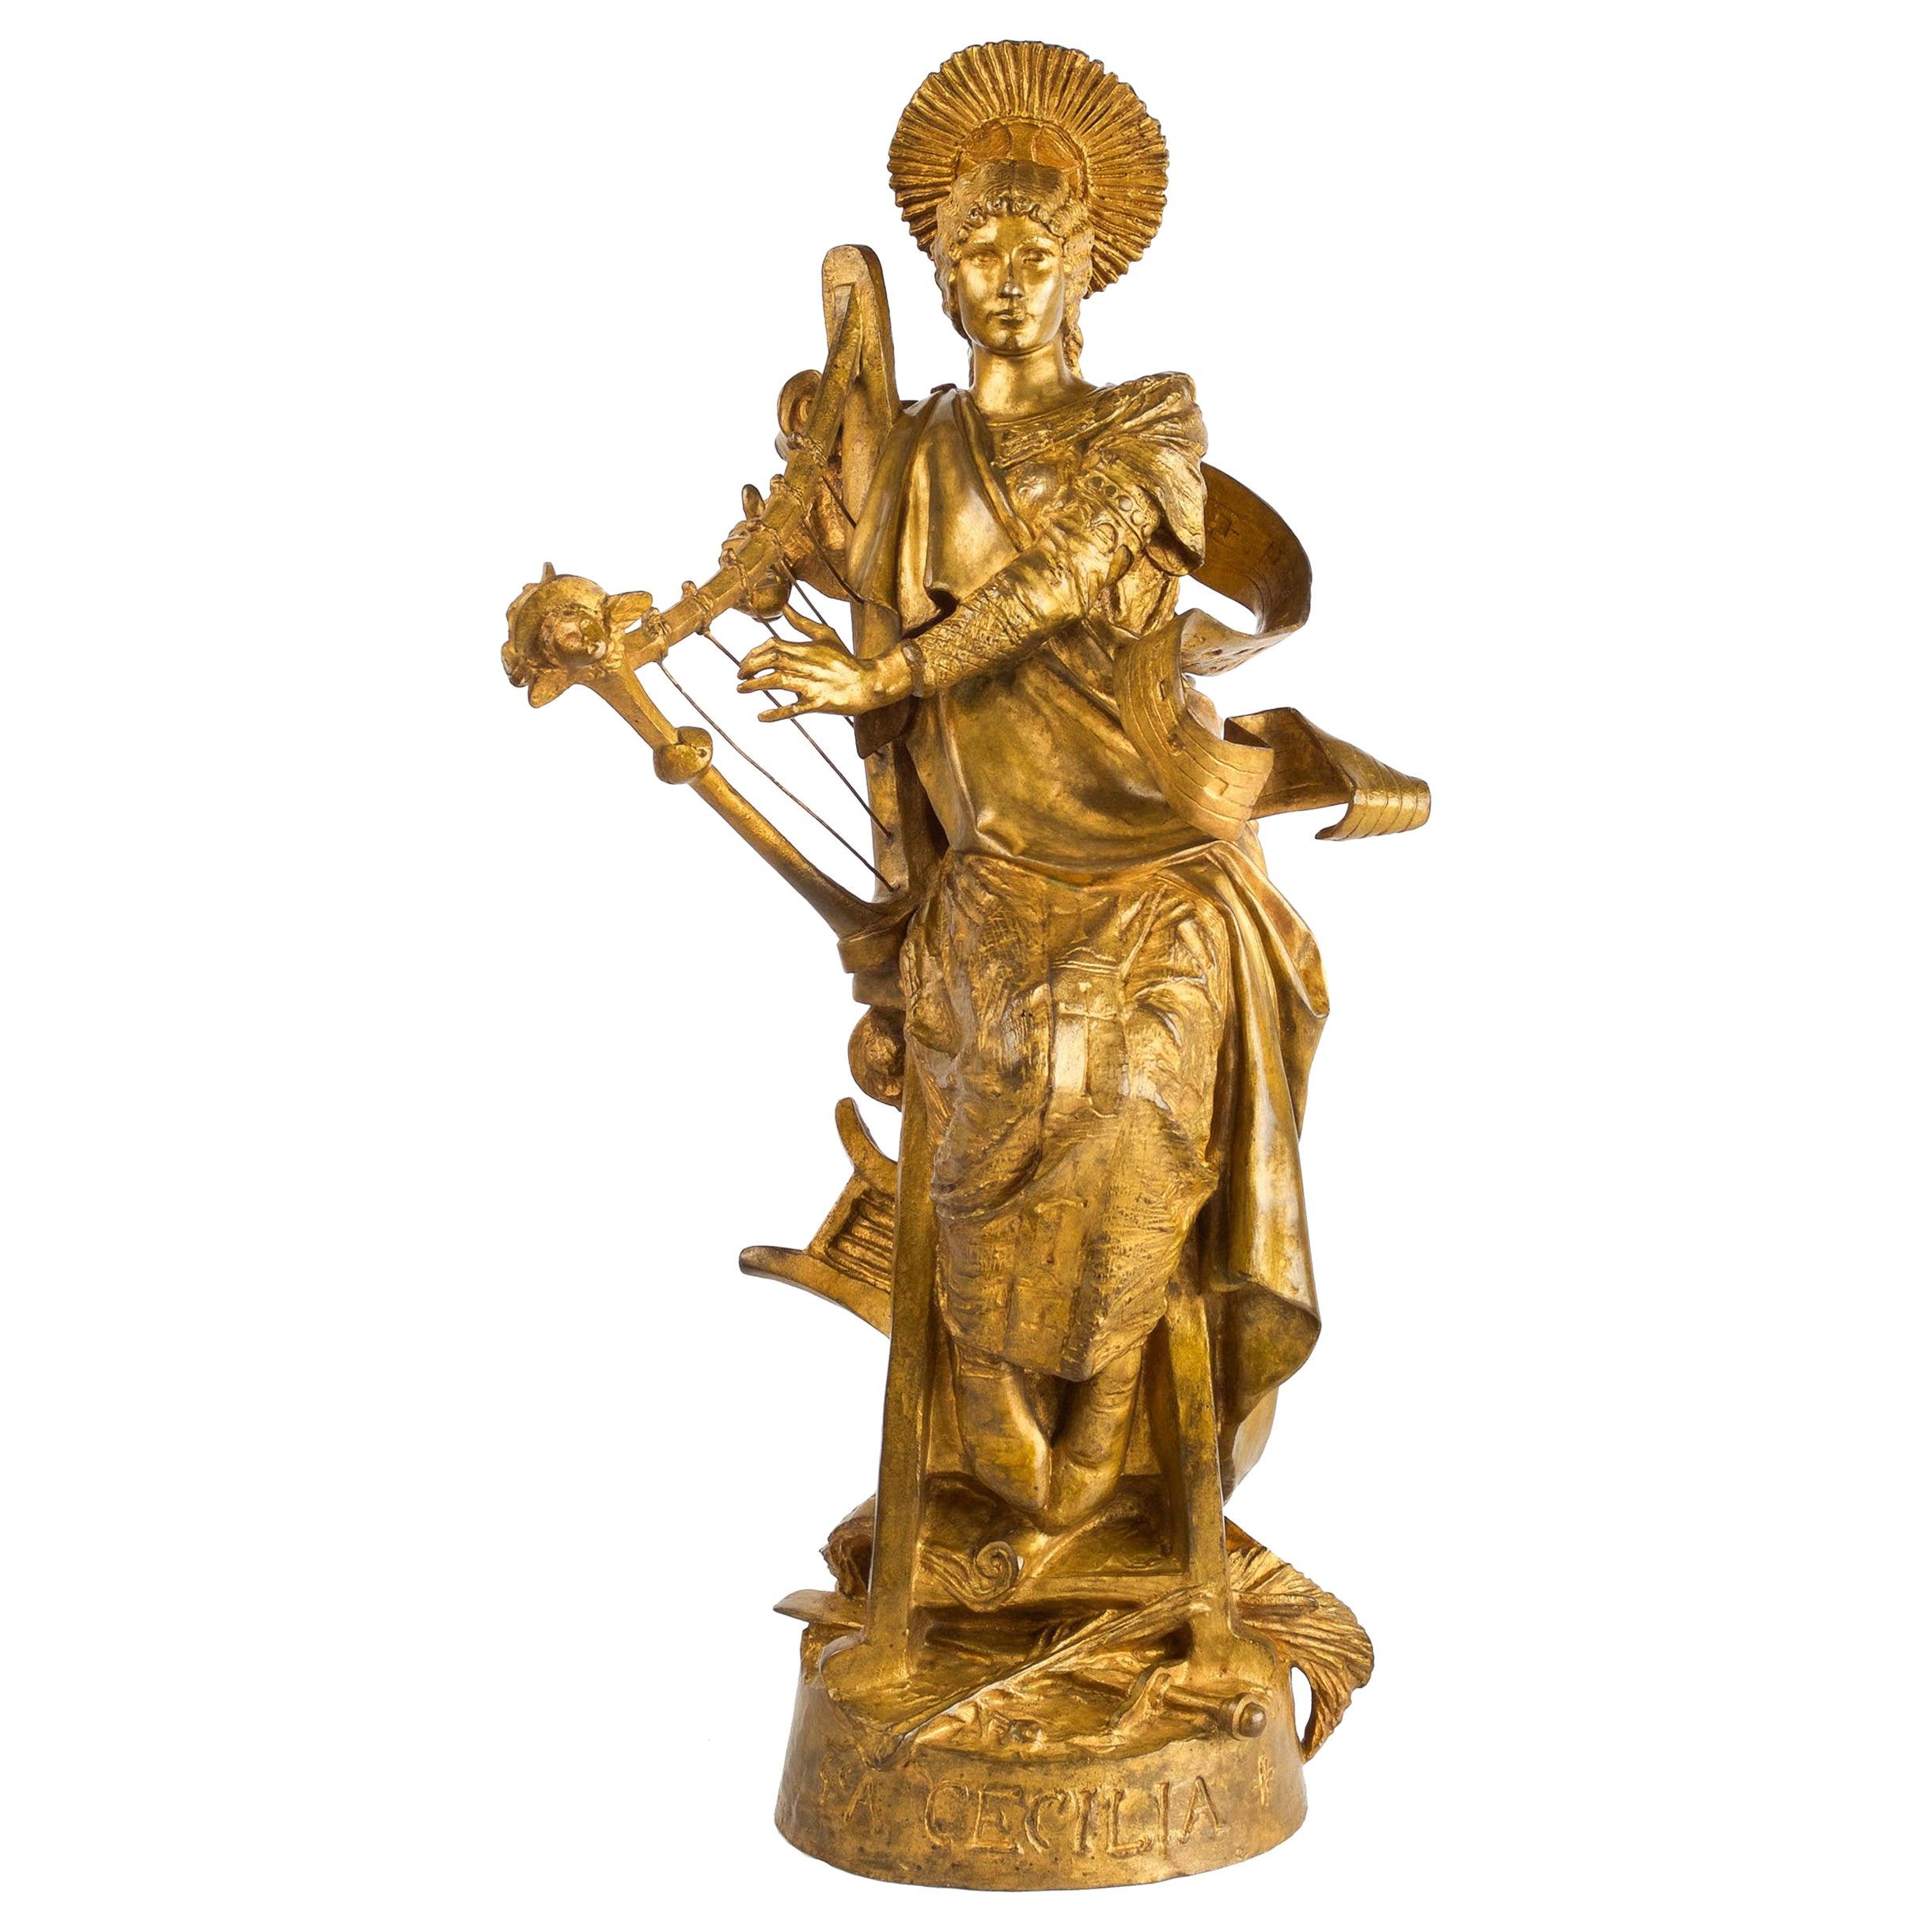 Rare French Antique Bronze Sculpture of St. Celicia by Emmanuel Fremiet